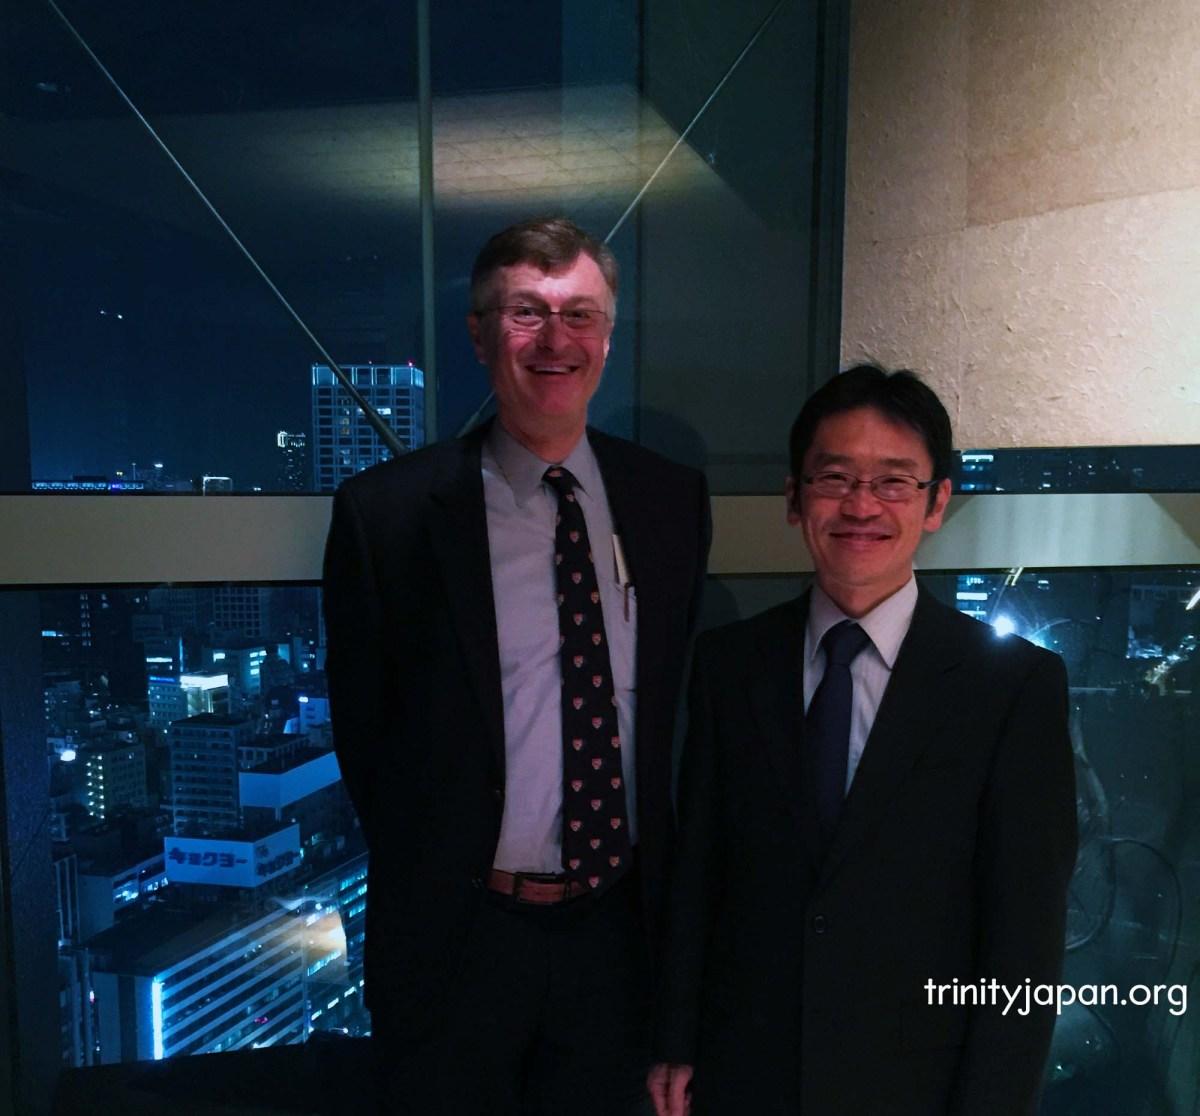 5th Trinity in Japan Society meeting in Tokyo on Friday 20 November 2015